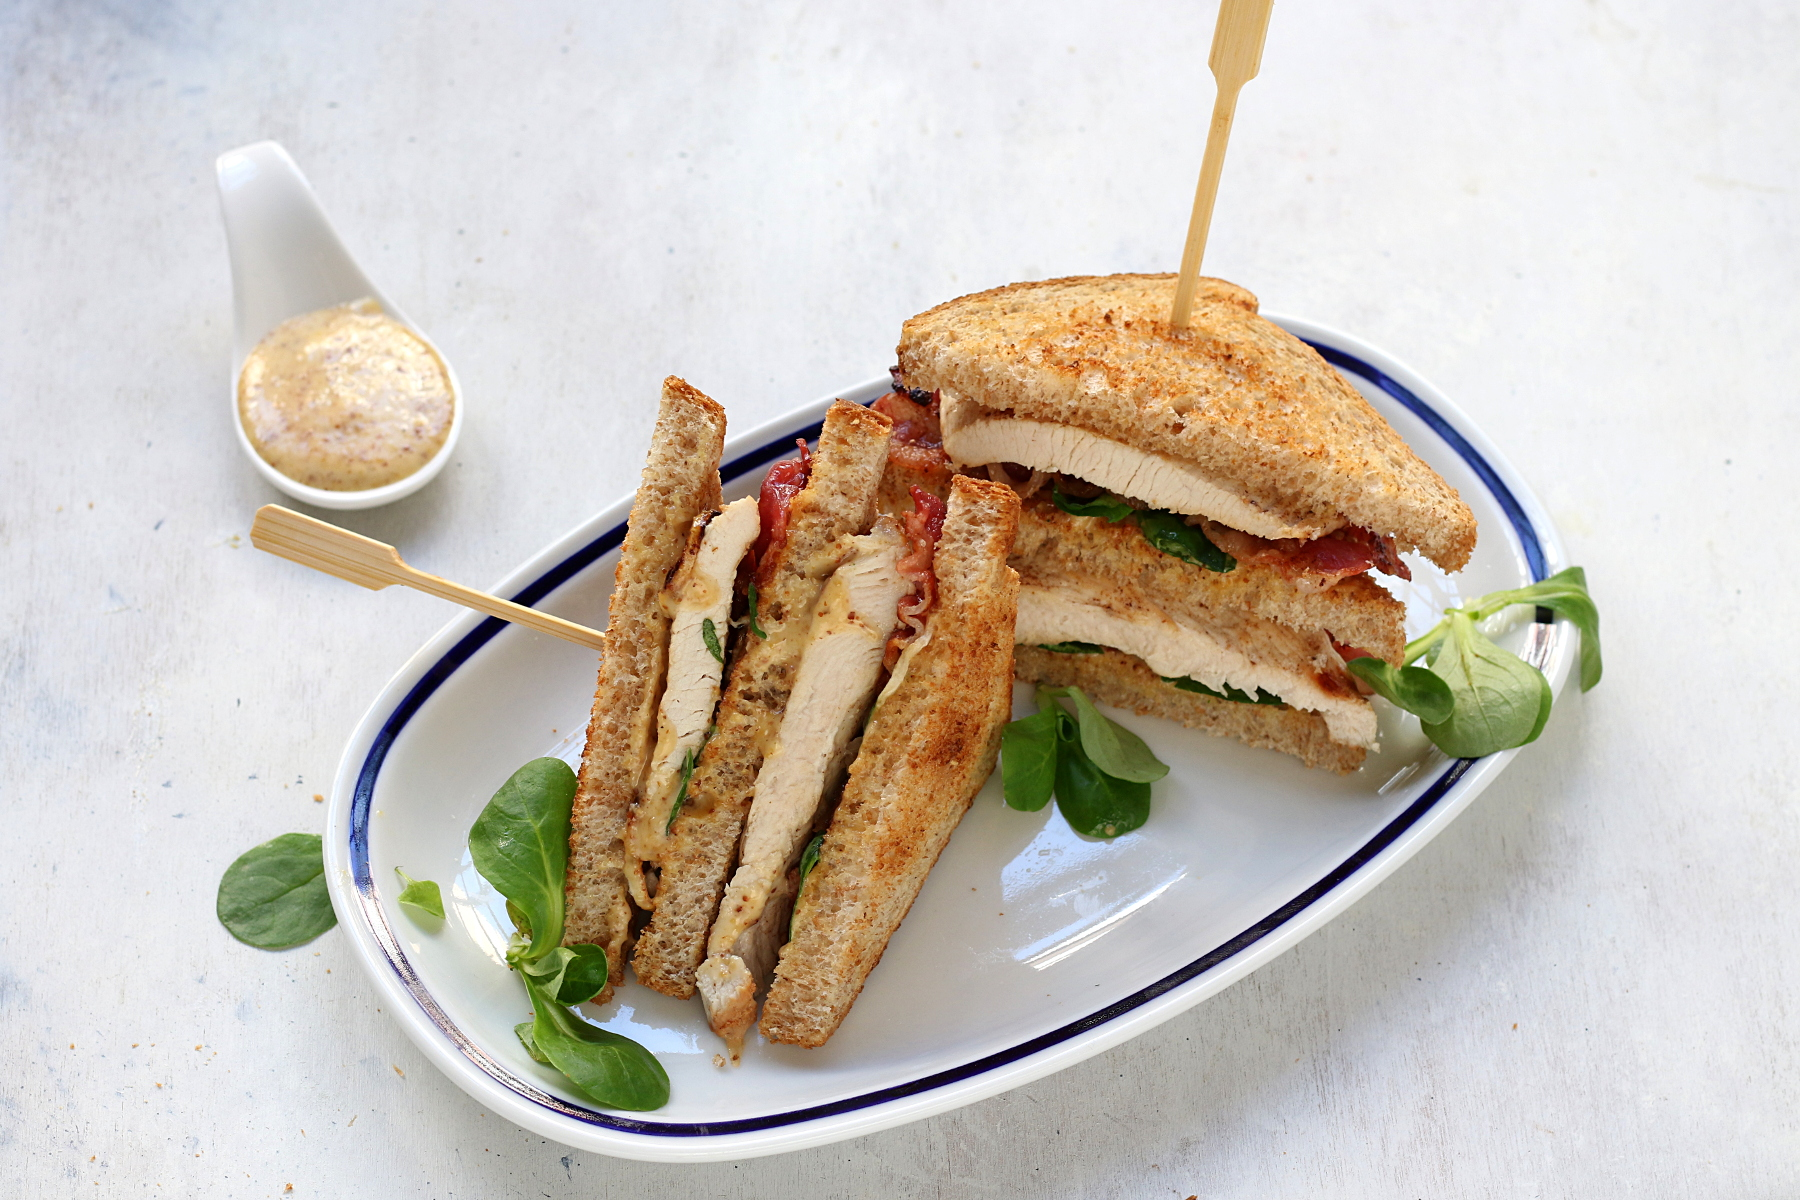 Ricetta del club sandwich